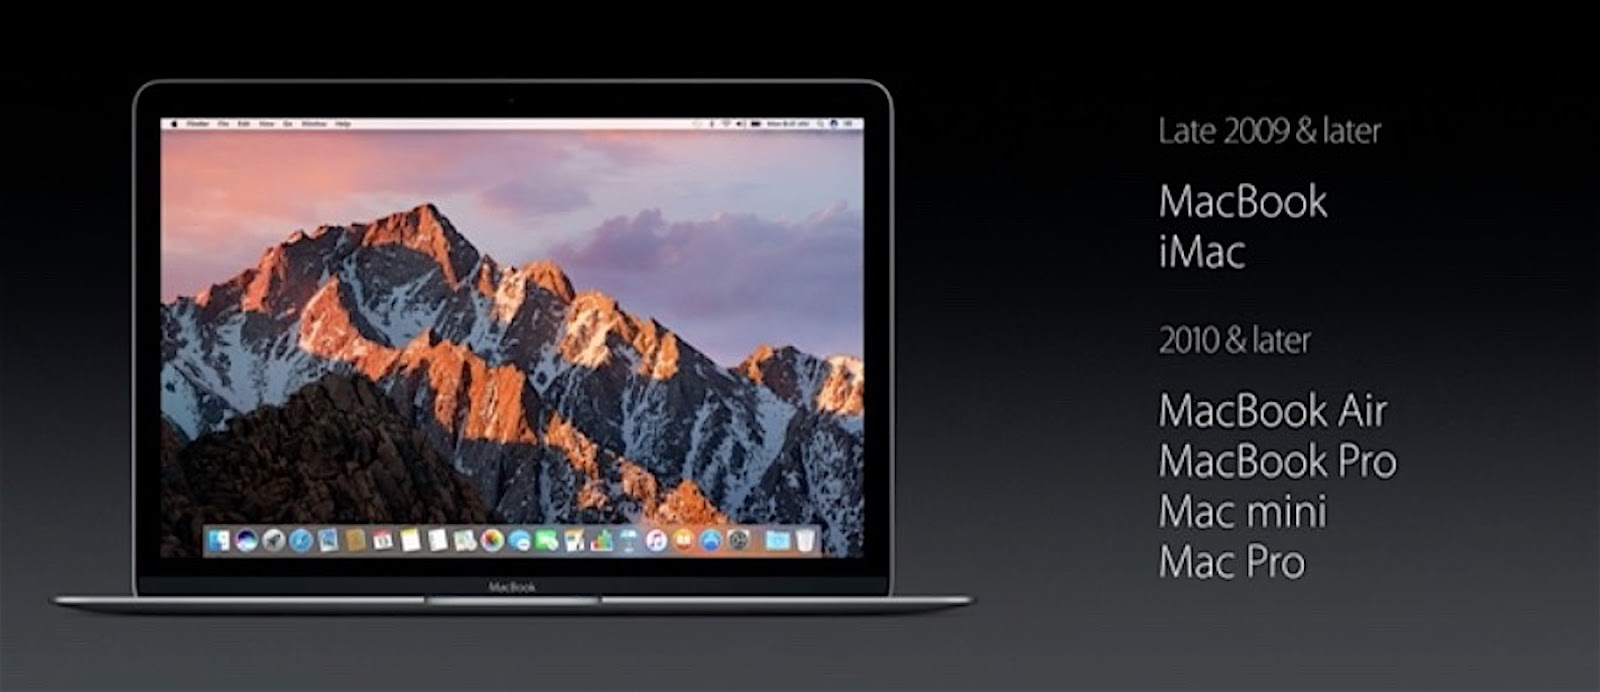 MacOS Sierra compatibility list